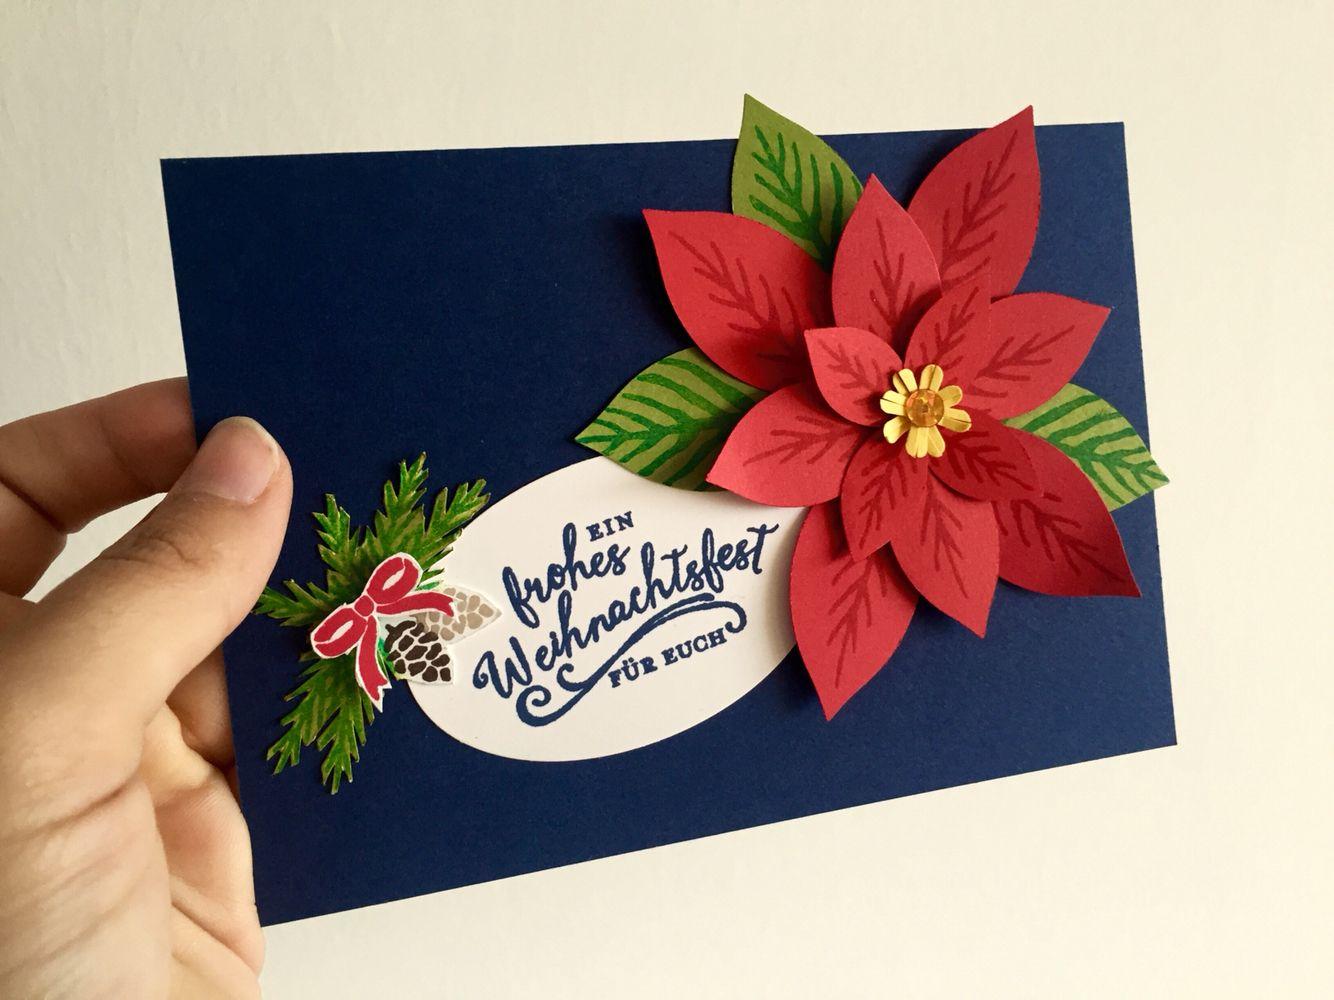 Diy Christmas Card 3d Christmas Star Selfmade Handcrafted Cards